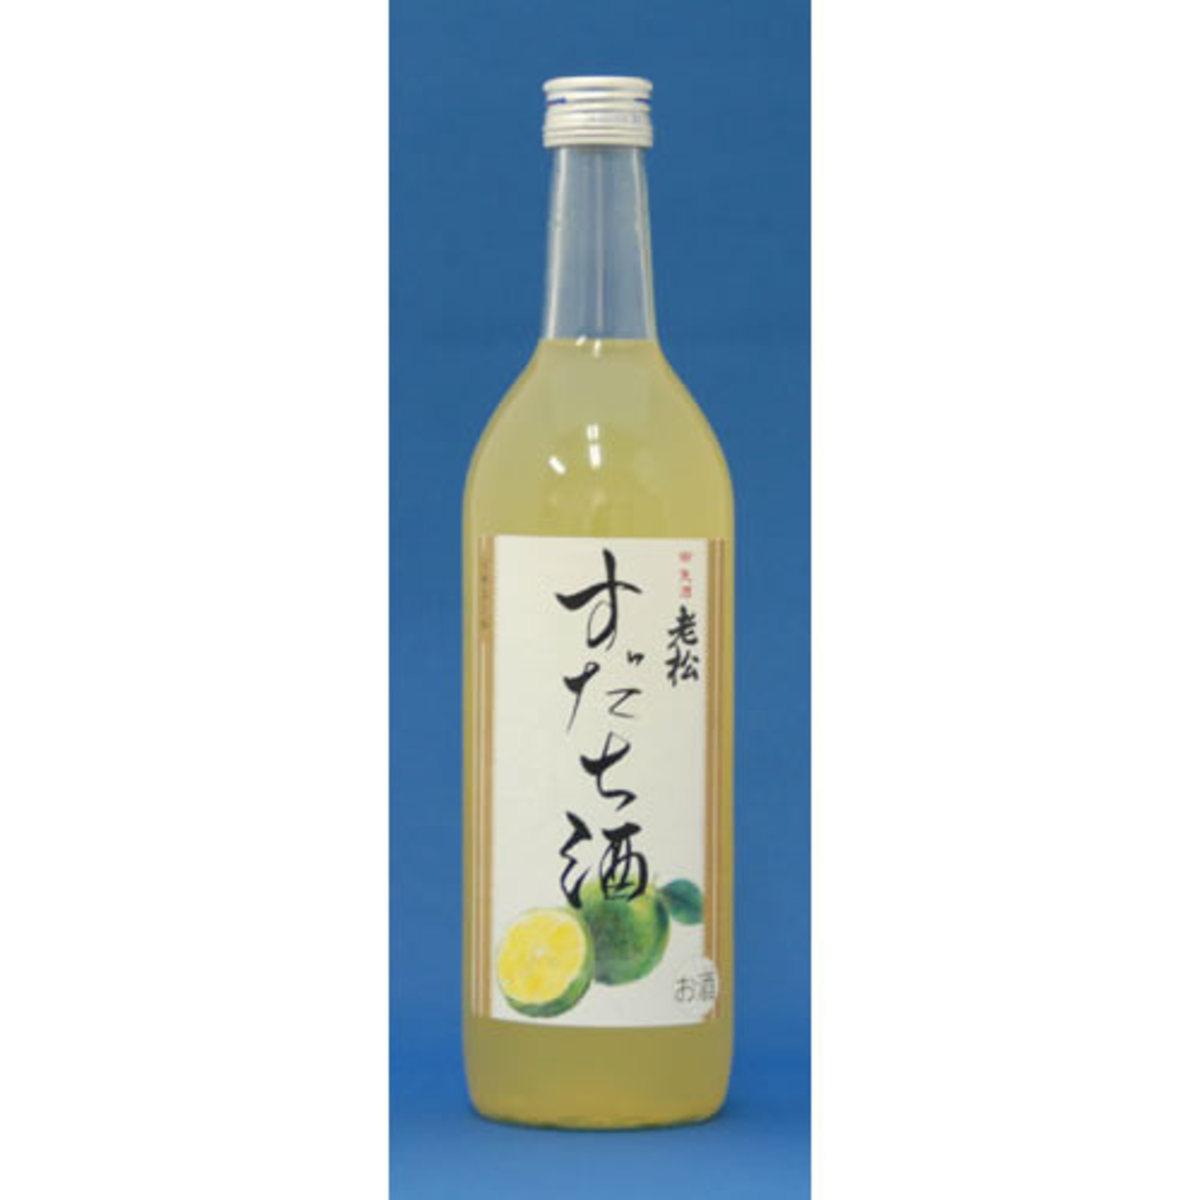 OIMATSU SUDACHI CITRUS SAKE 720ML